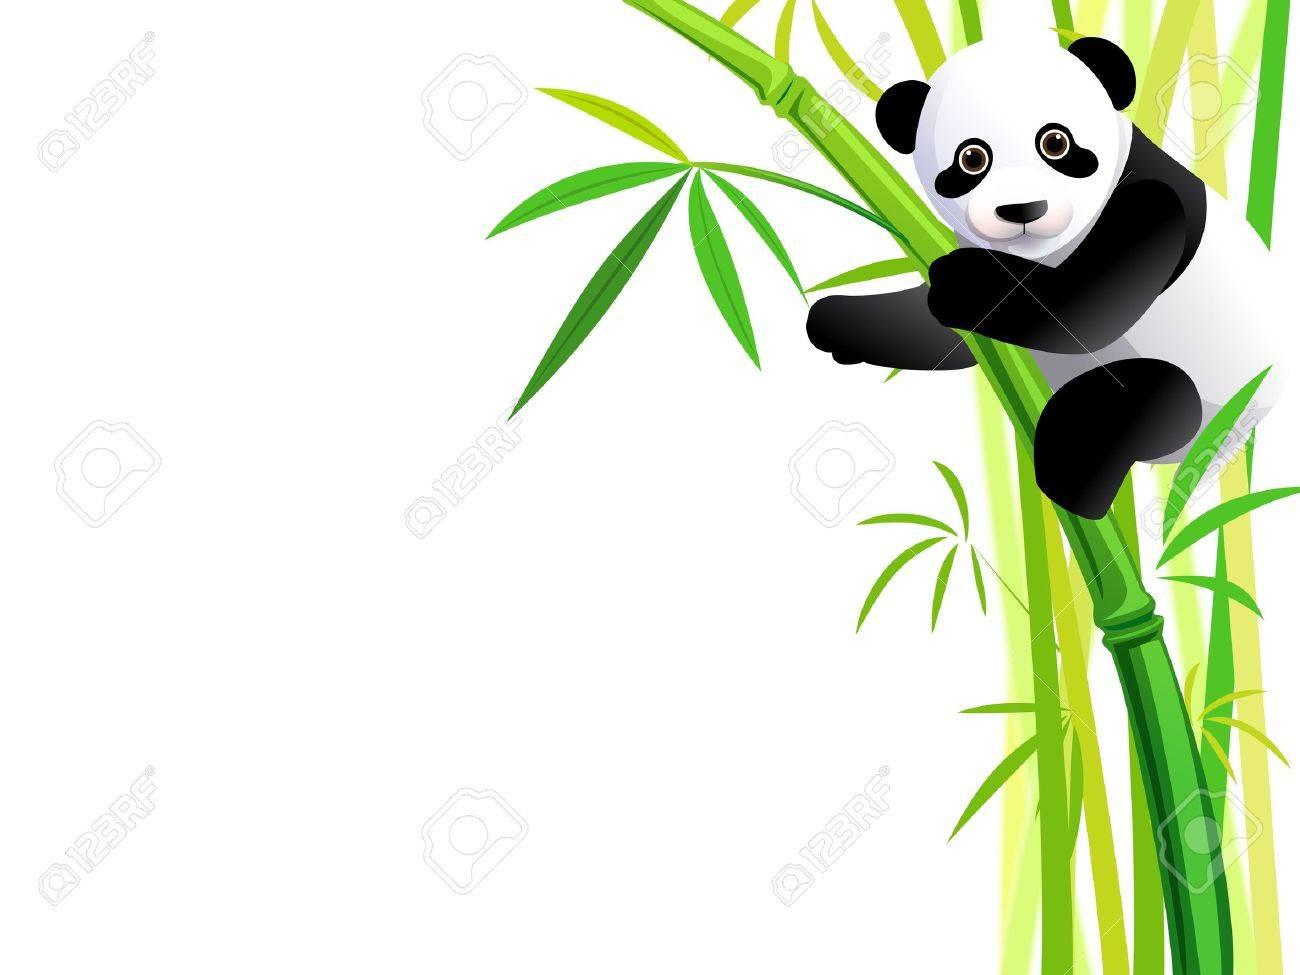 Bamboo Forest Cartoon